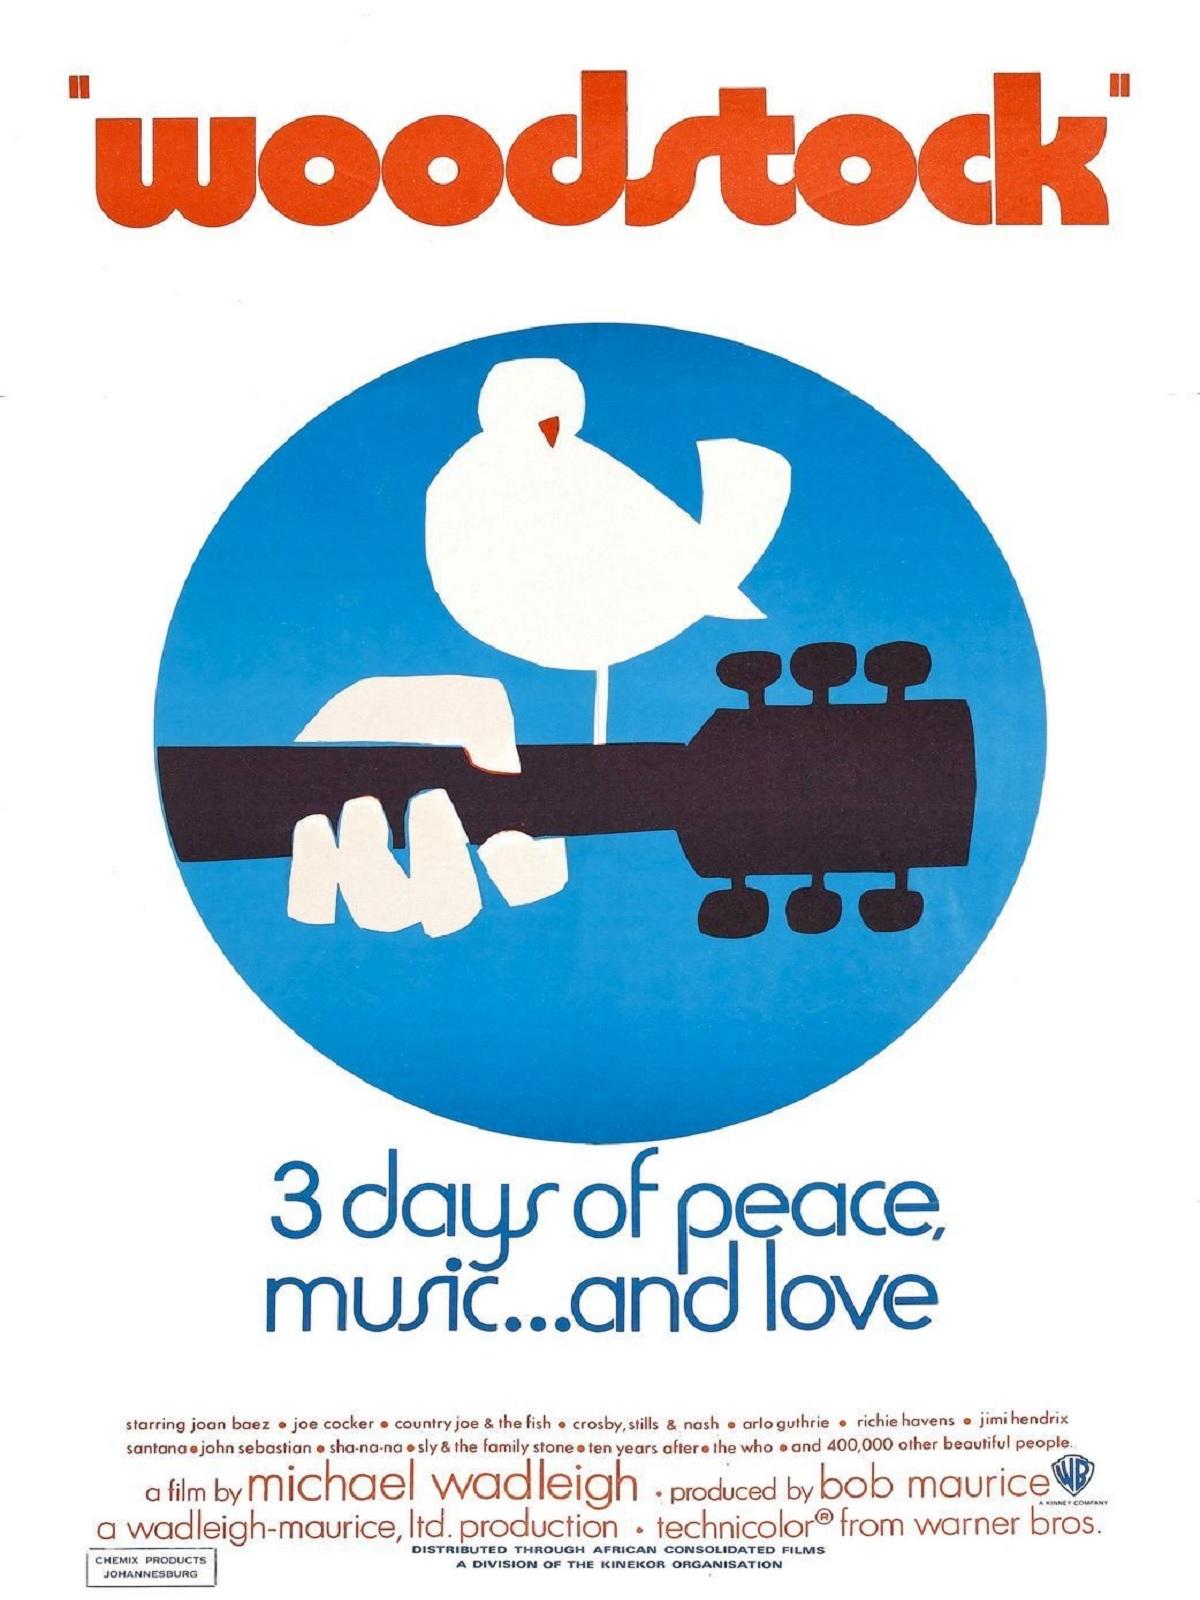 musica-woodstock-cartaz0